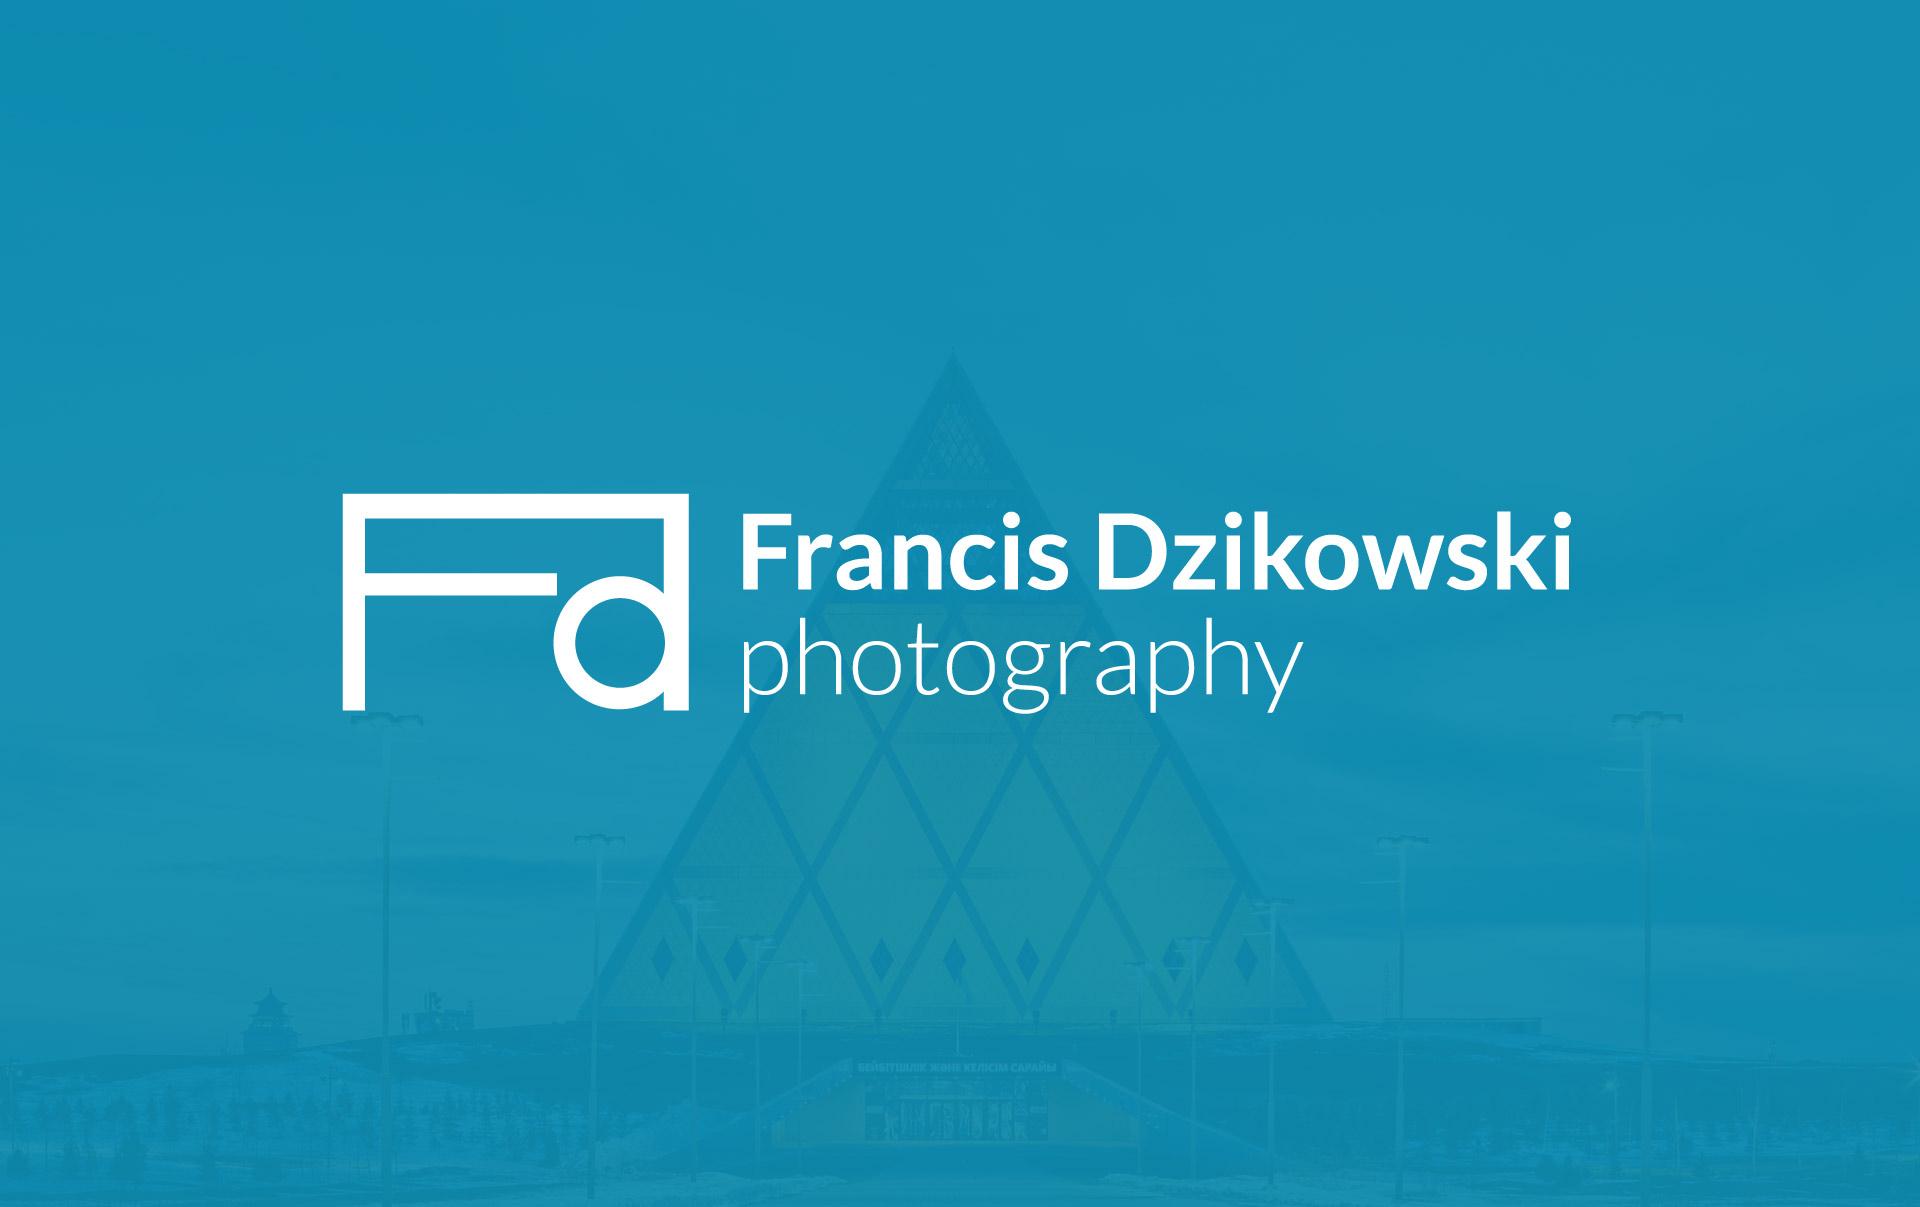 Francis Dzikowski Photography